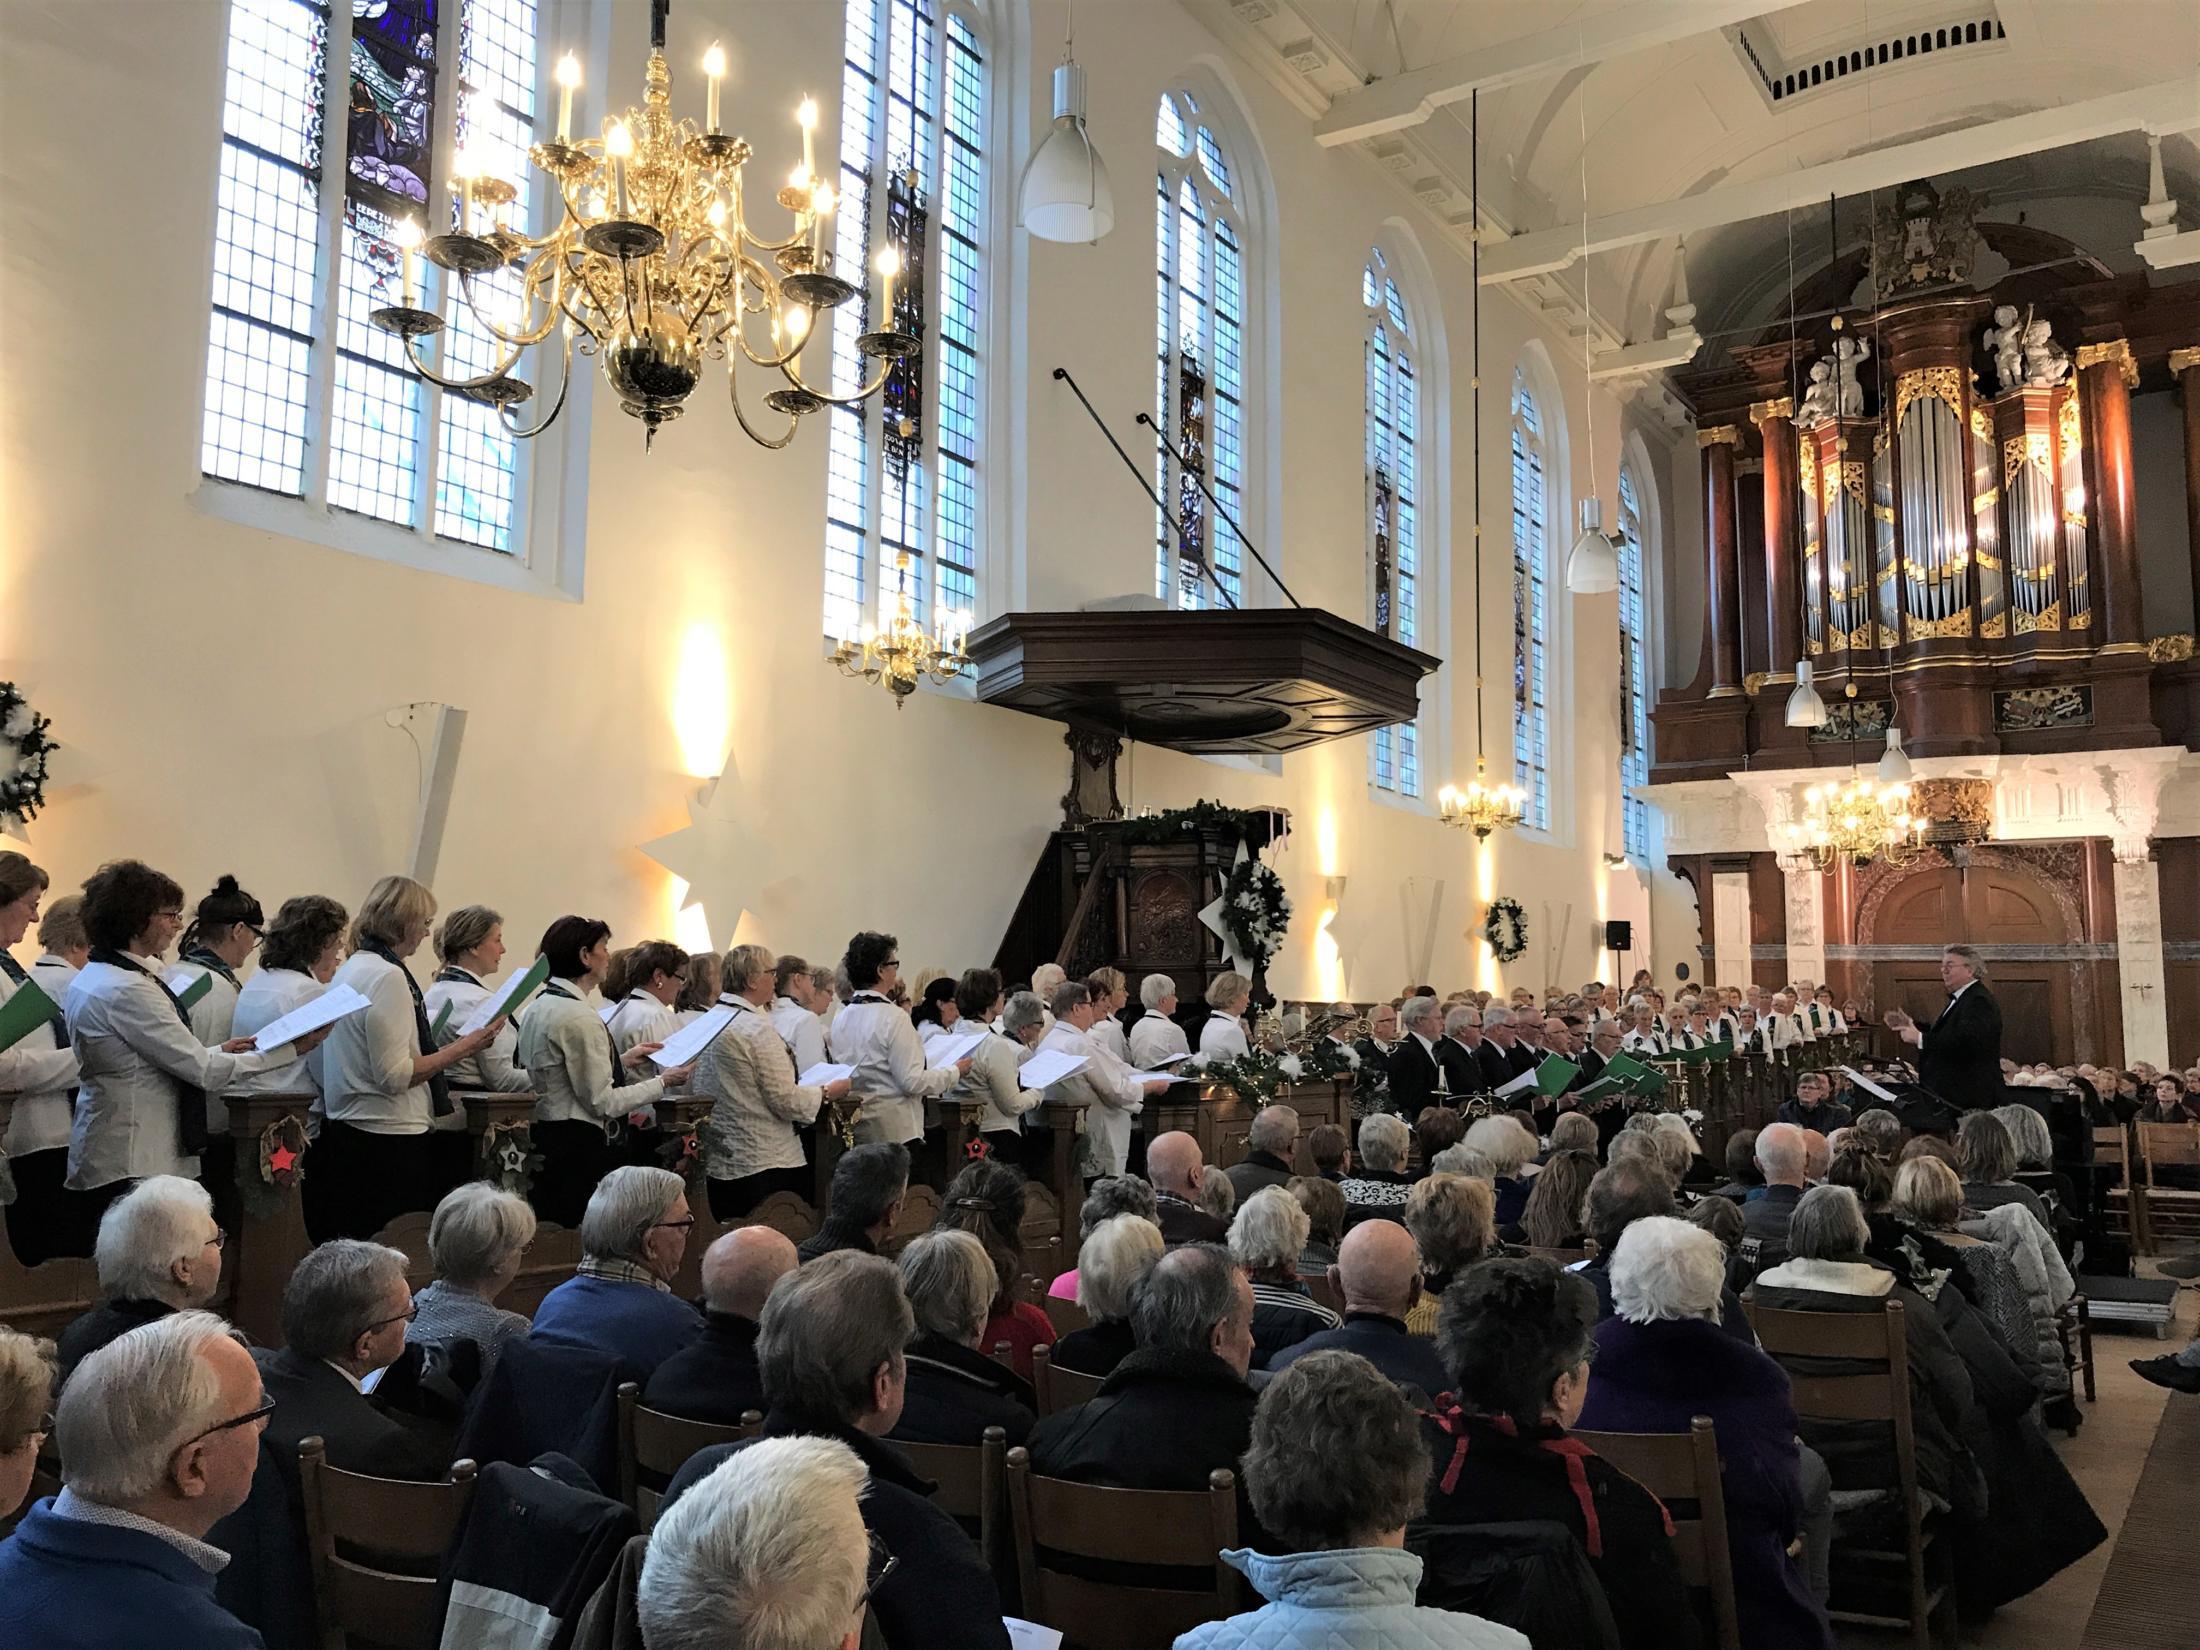 Concert Kapelkerk foto 1